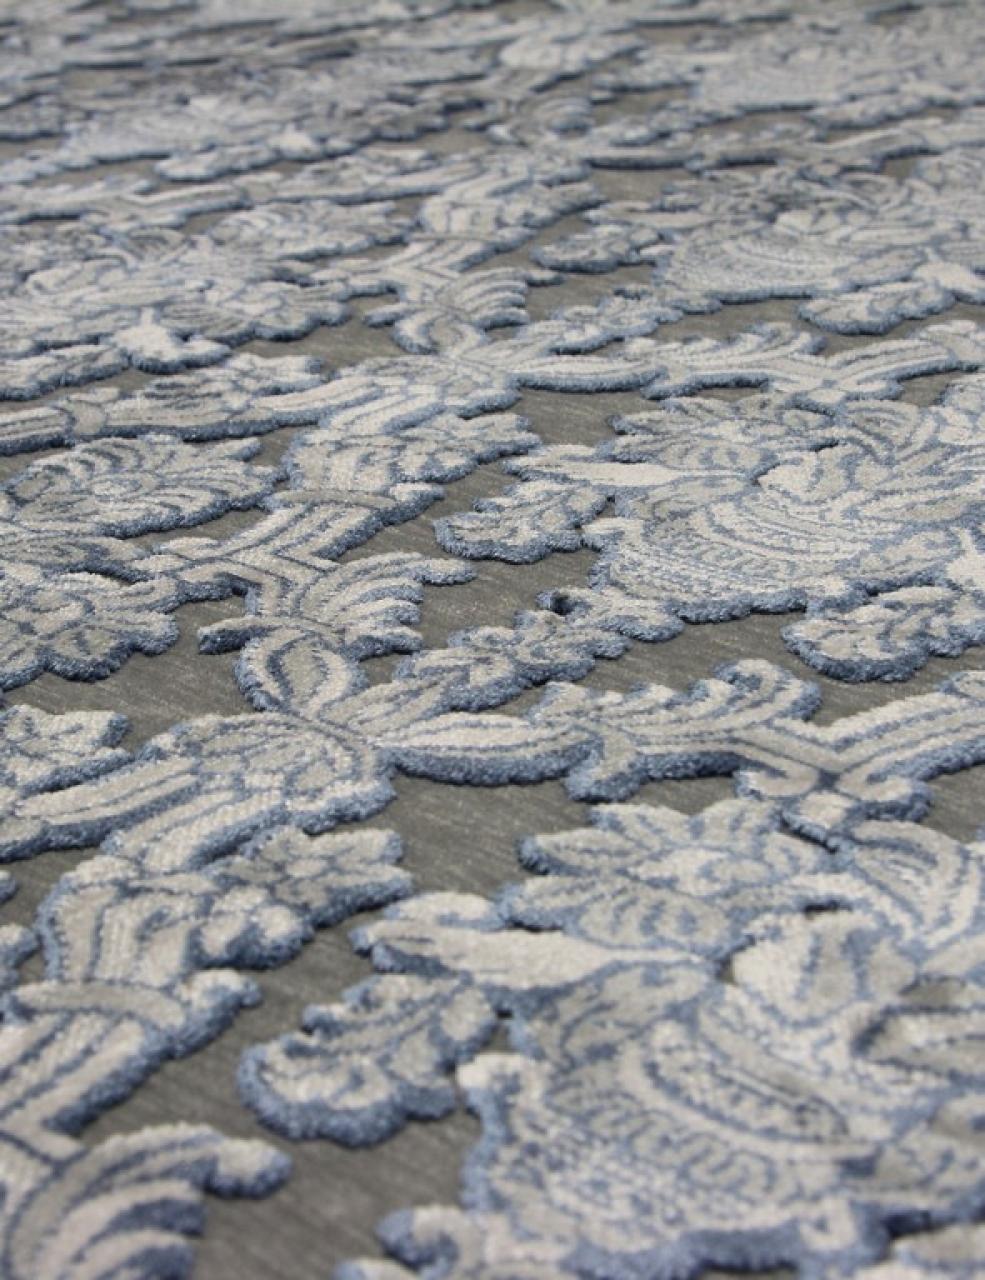 Ковер 0VC996 - SKY BLUE - Прямоугольник - коллекция TIFFANY - фото 5